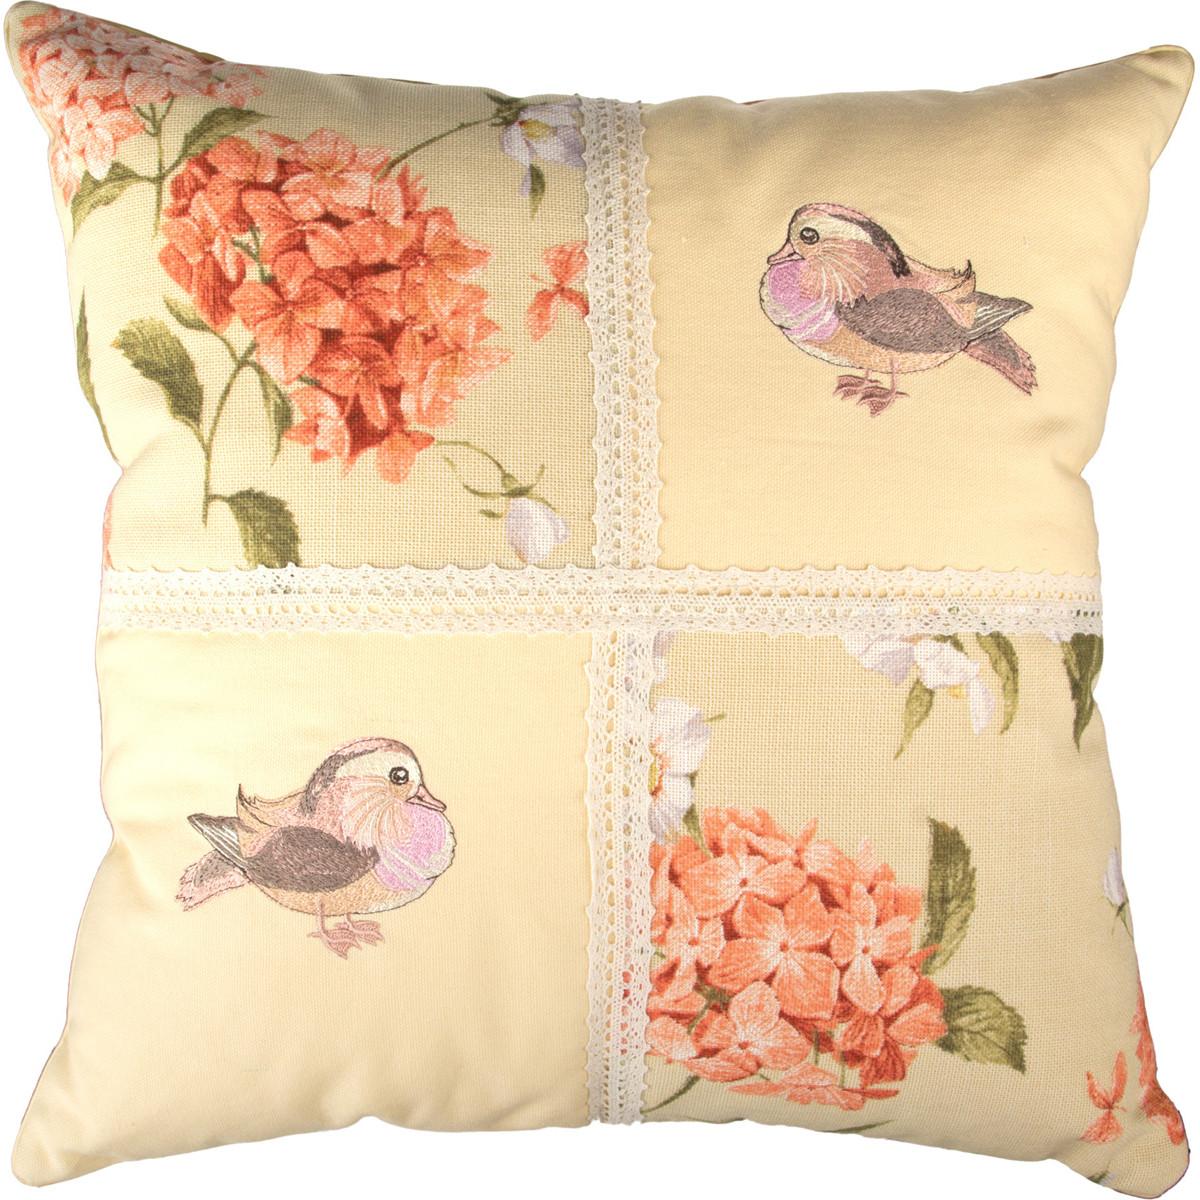 Декоративные подушки Santalino Декоративная подушка Gresham (46х46) подушка декоративная santalino райский сад 850 818 6